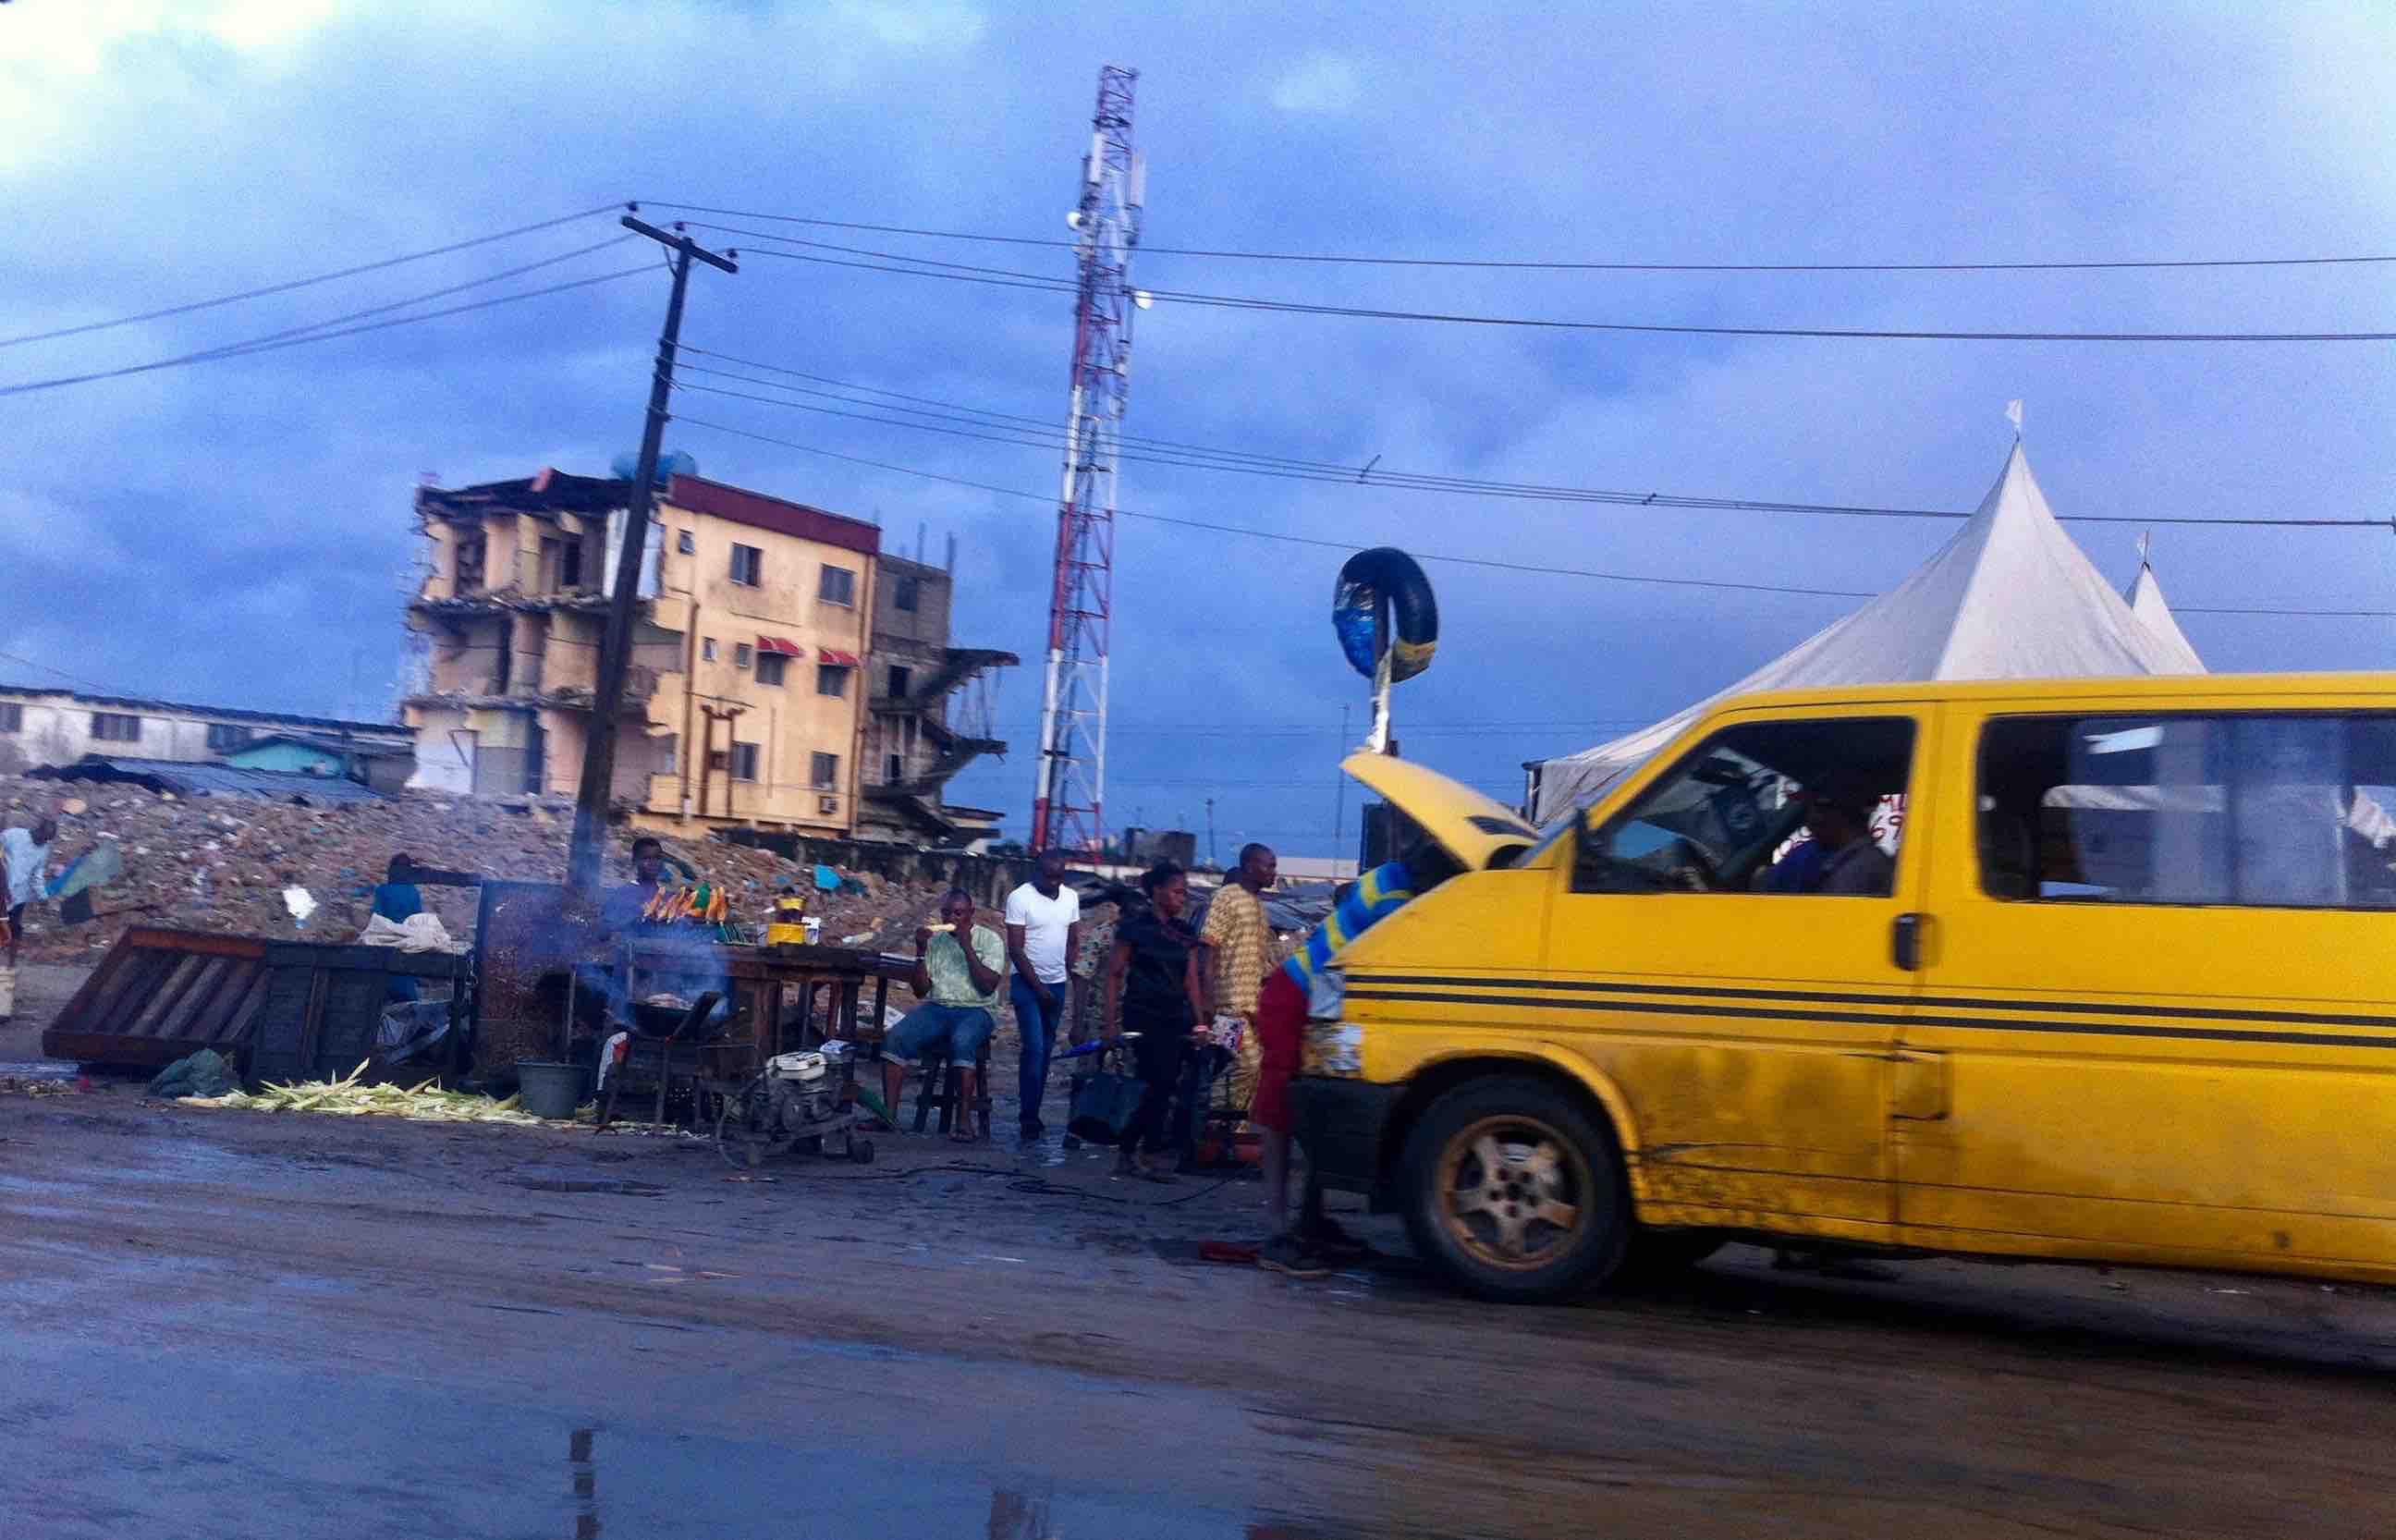 Street Food, Roast Corn, Lagos – Badagry Expressway, Lagos State, Nigeria. #JujuFilms